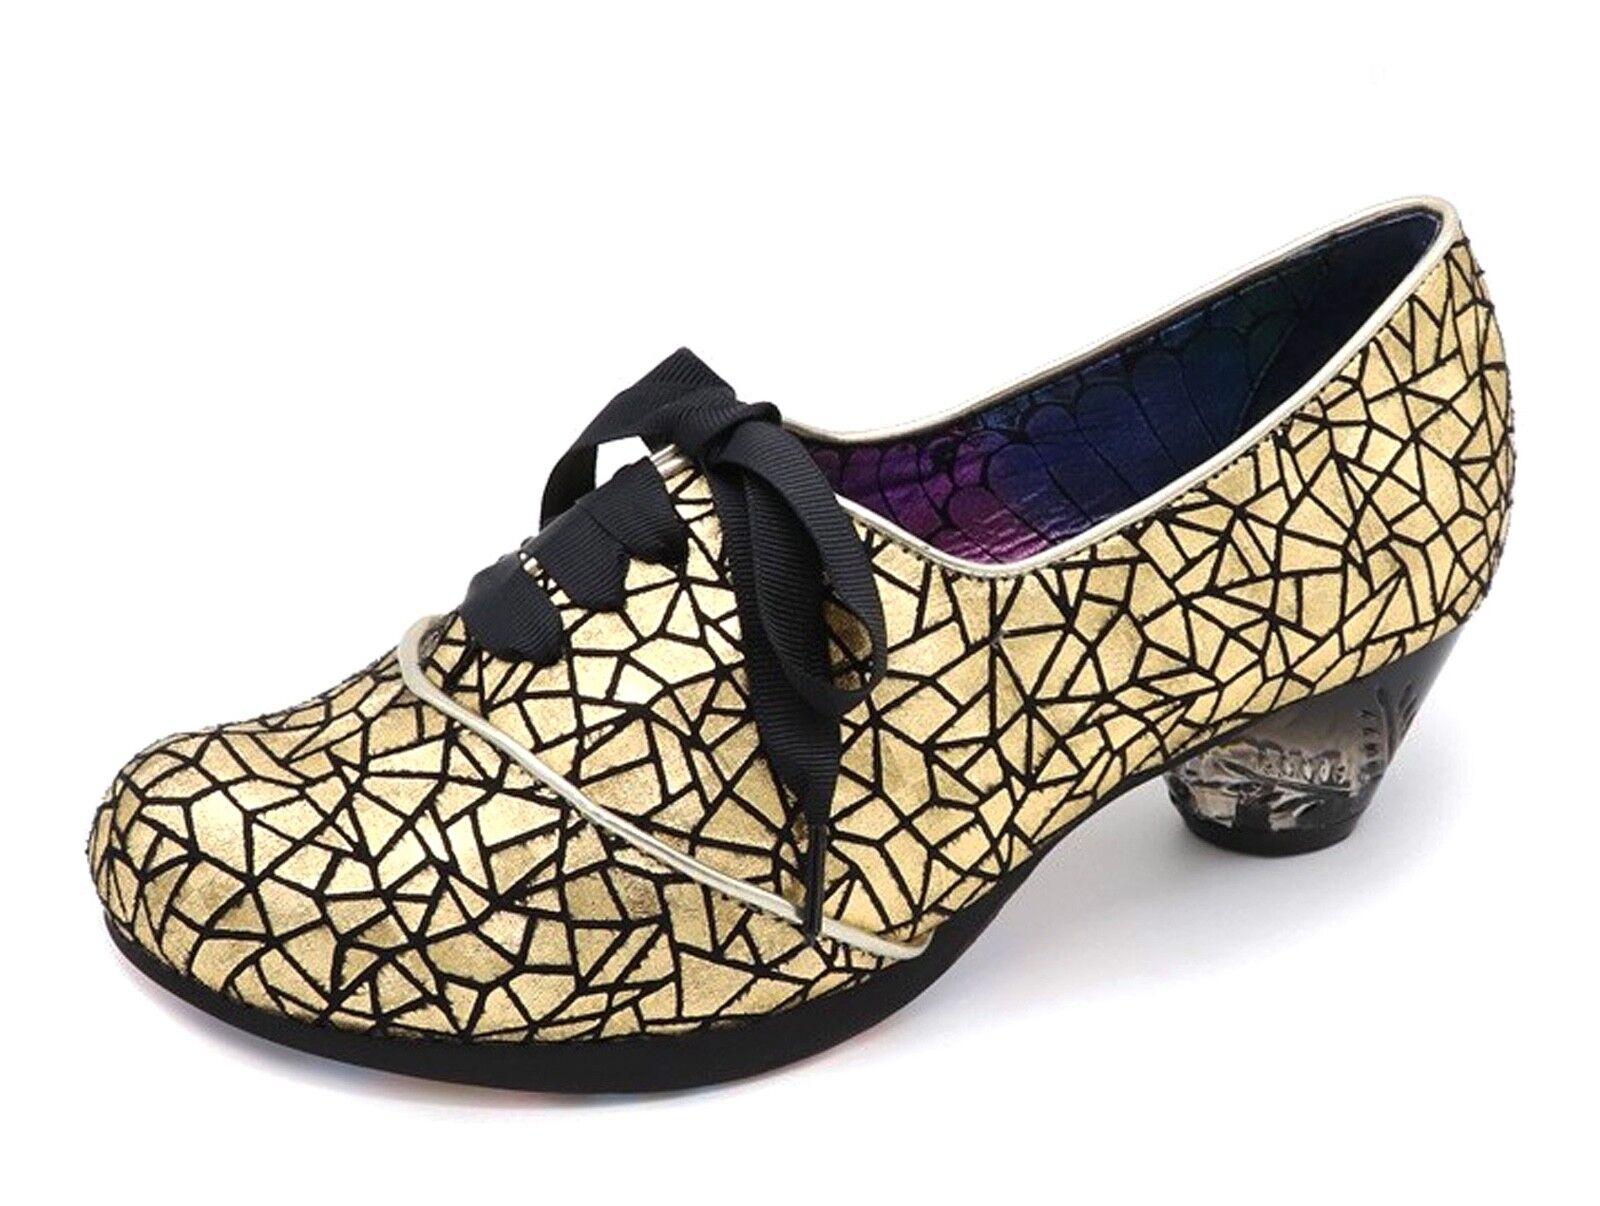 Irregular Choice NEW Curio low heel heel heel gold black metallic lace up shoes sizes 3-9 7073d8